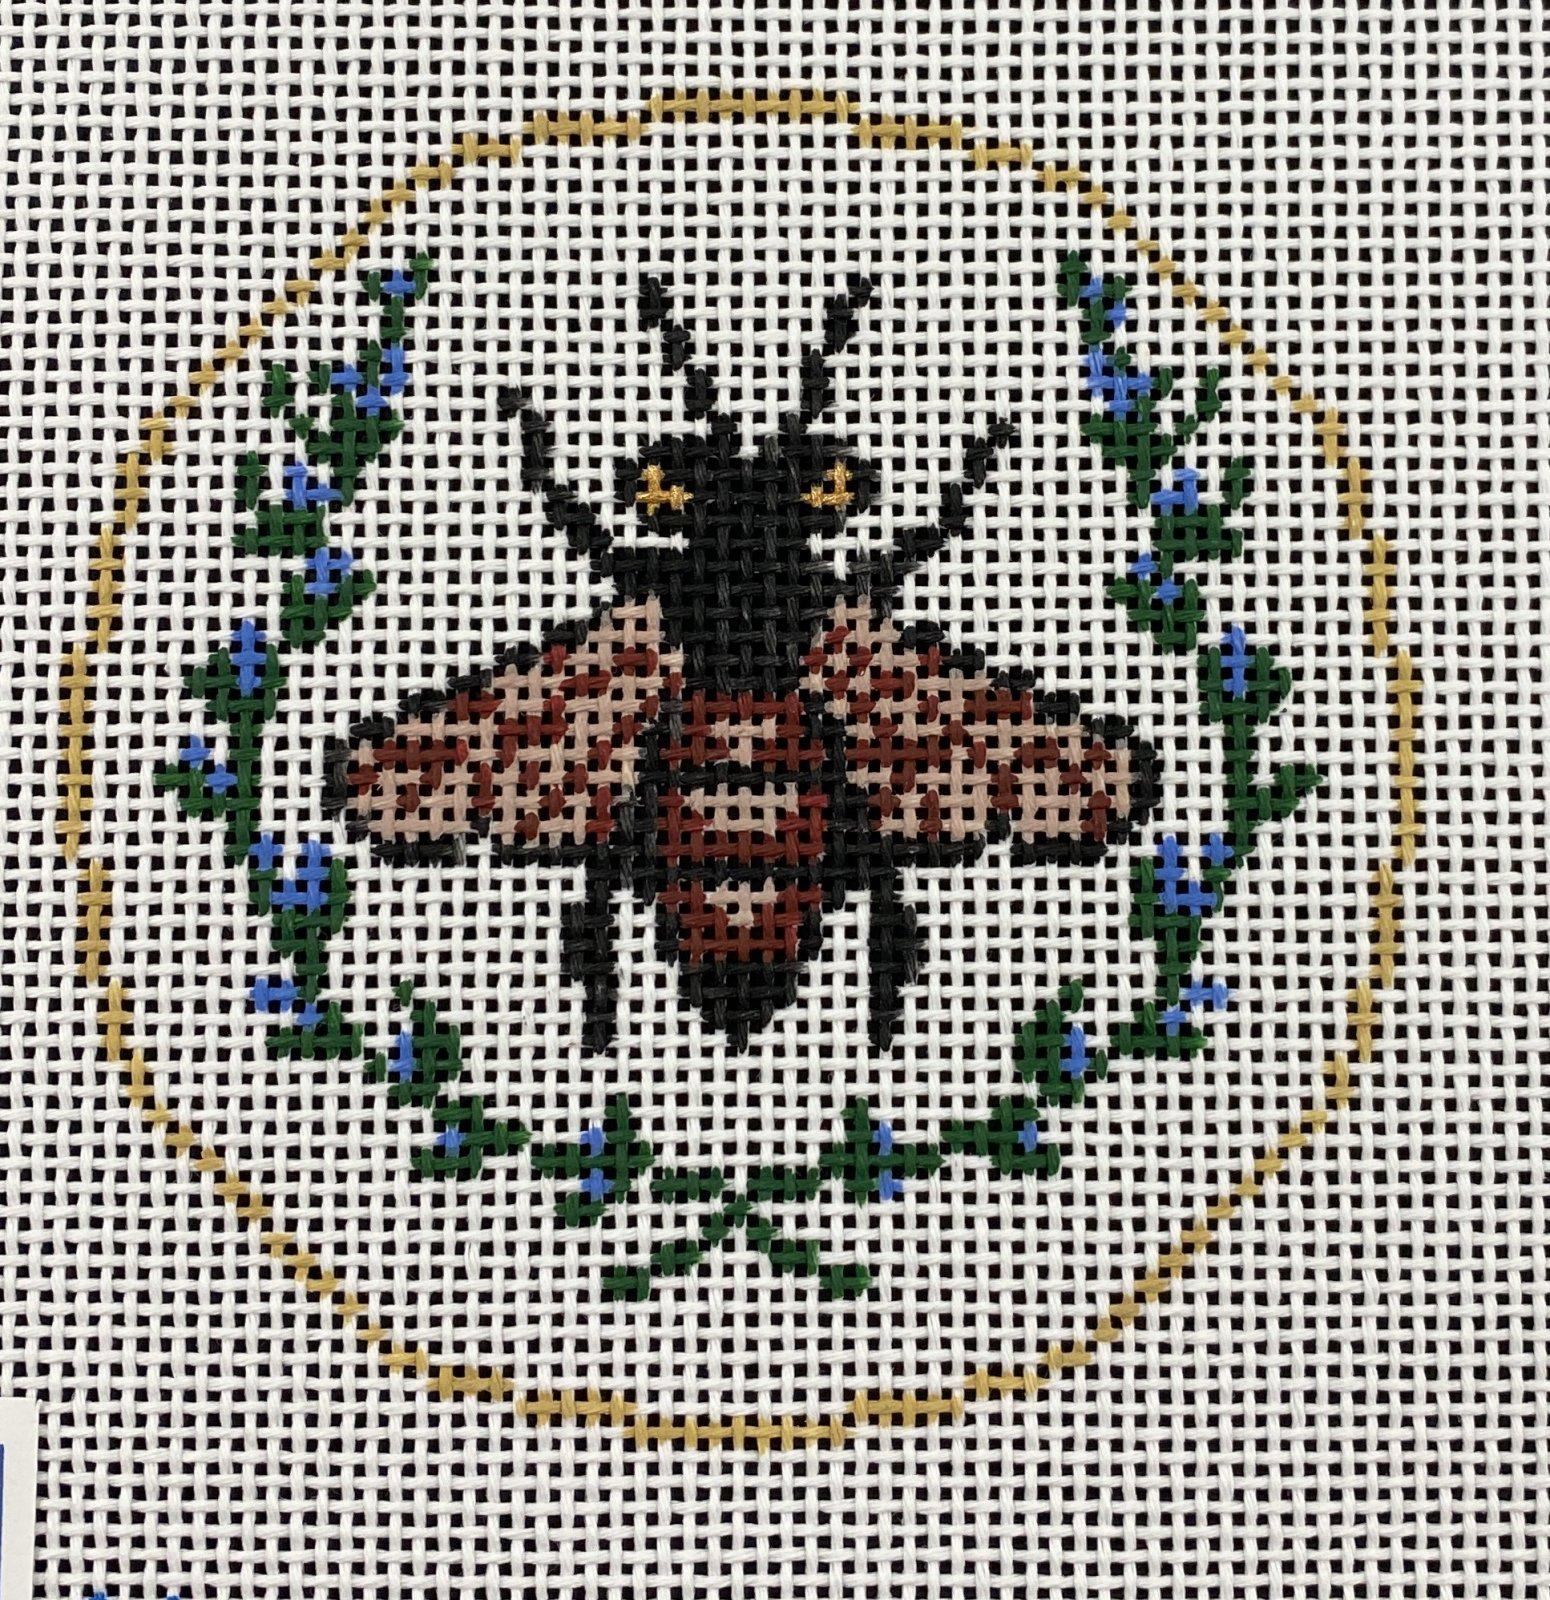 Black Bee,13ct.,4.25x4.25